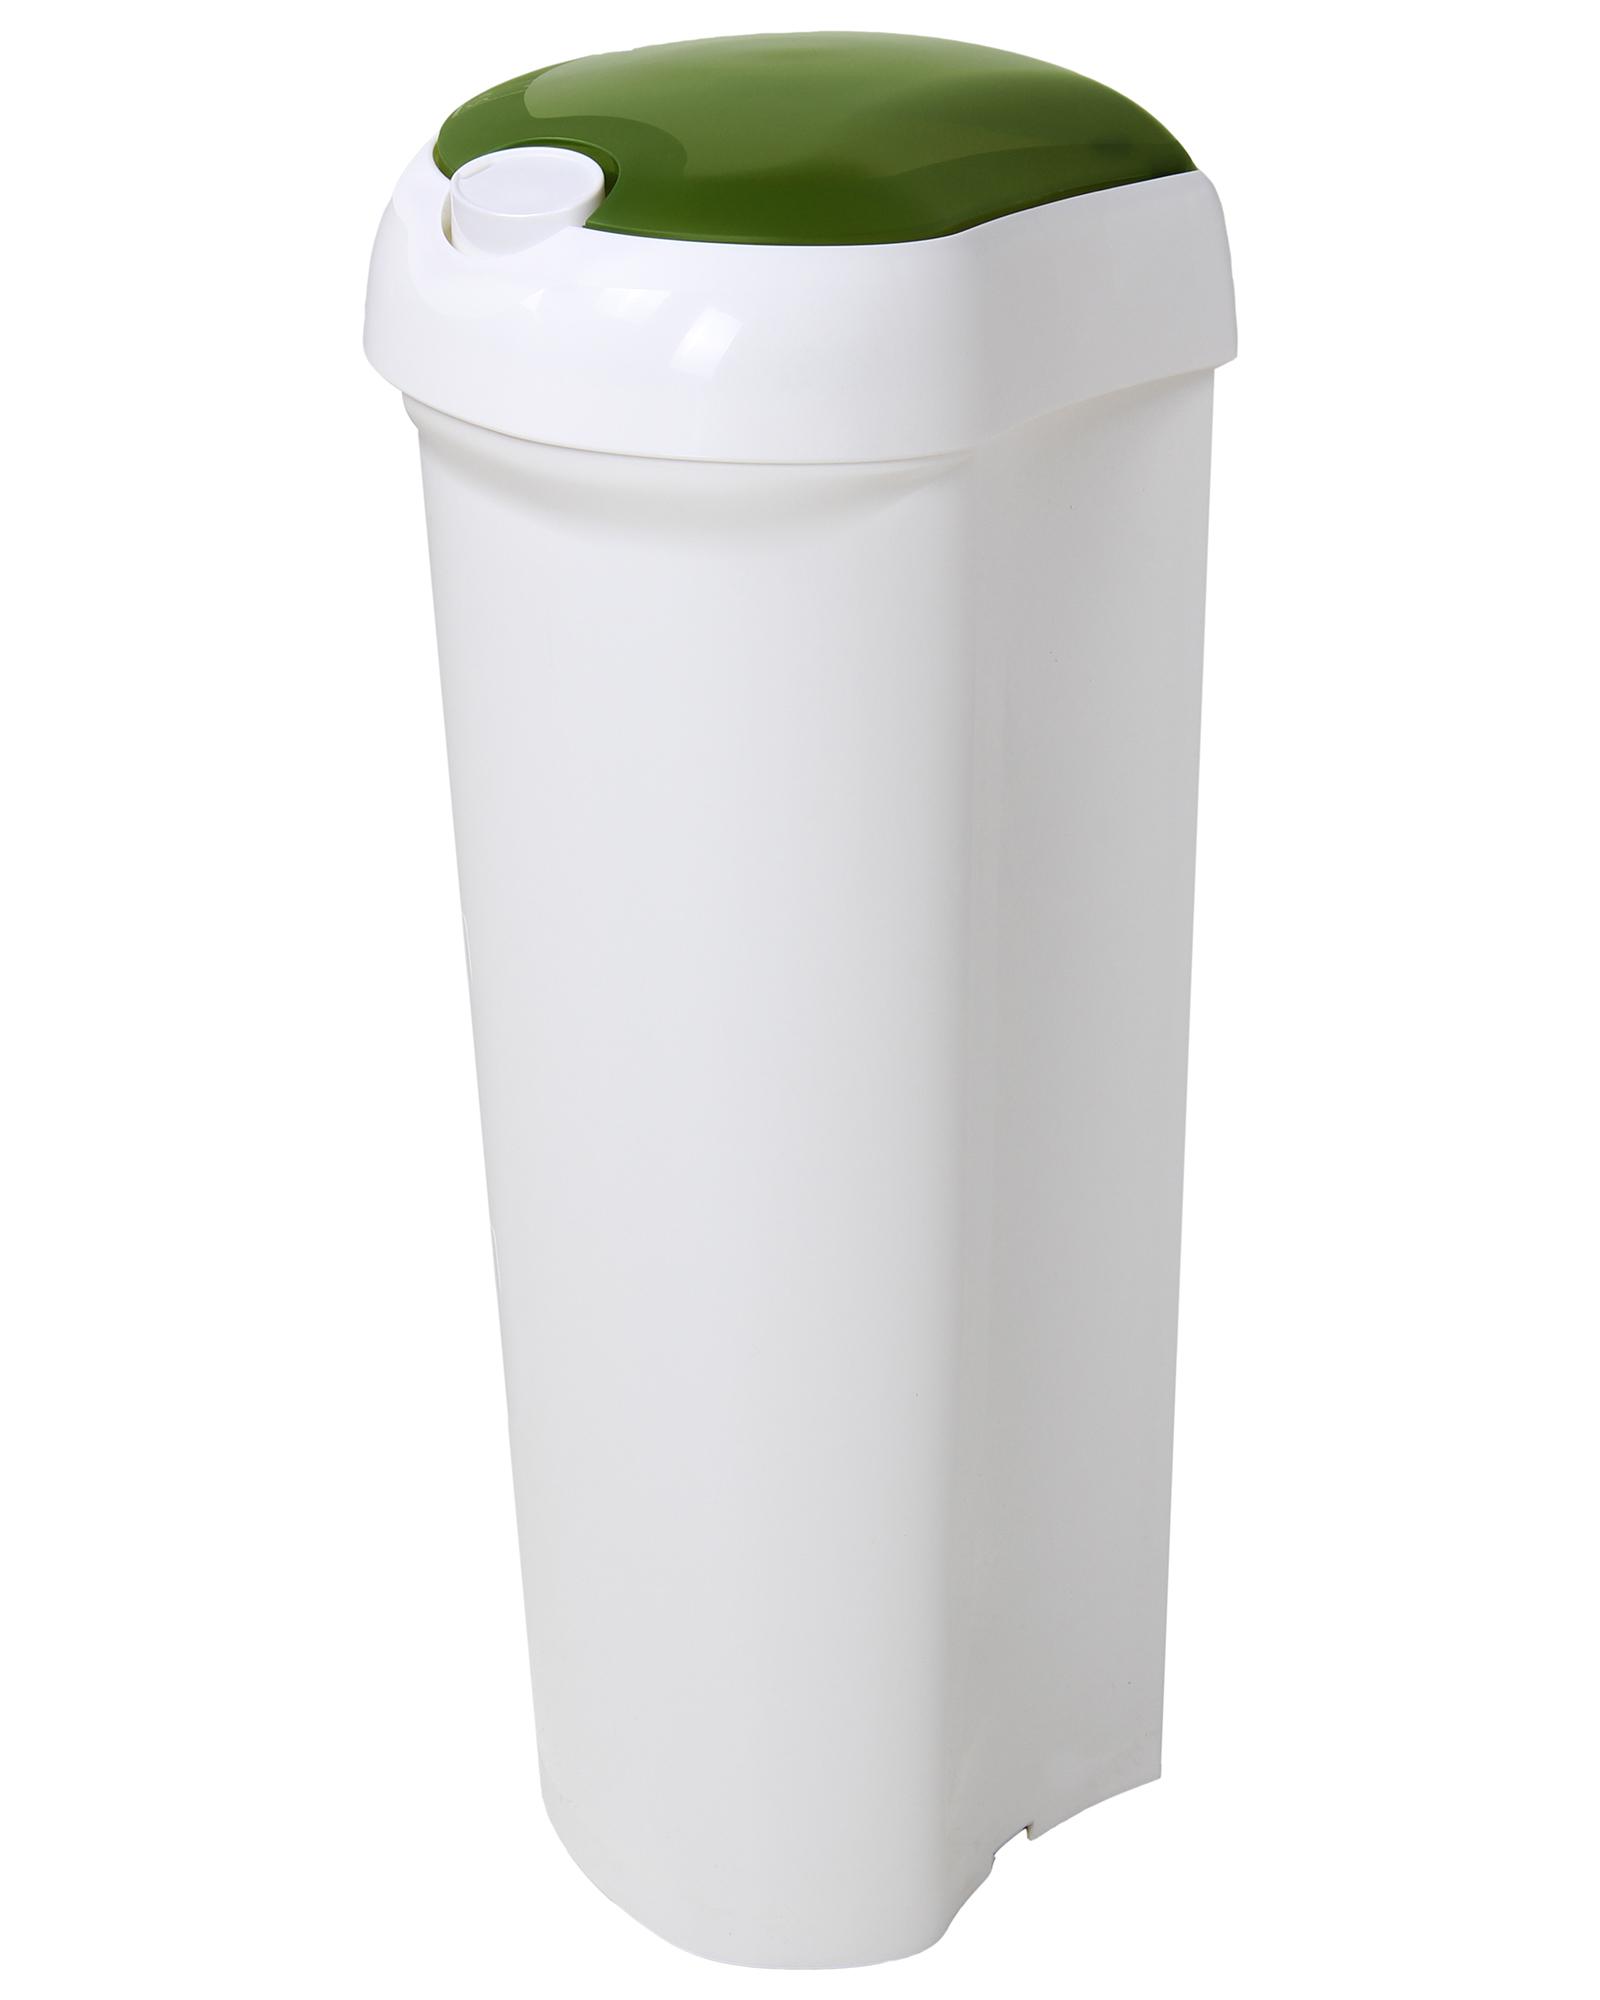 ondis24 m lleimer lotus modul 30 liter gr n g nstig online kaufen. Black Bedroom Furniture Sets. Home Design Ideas